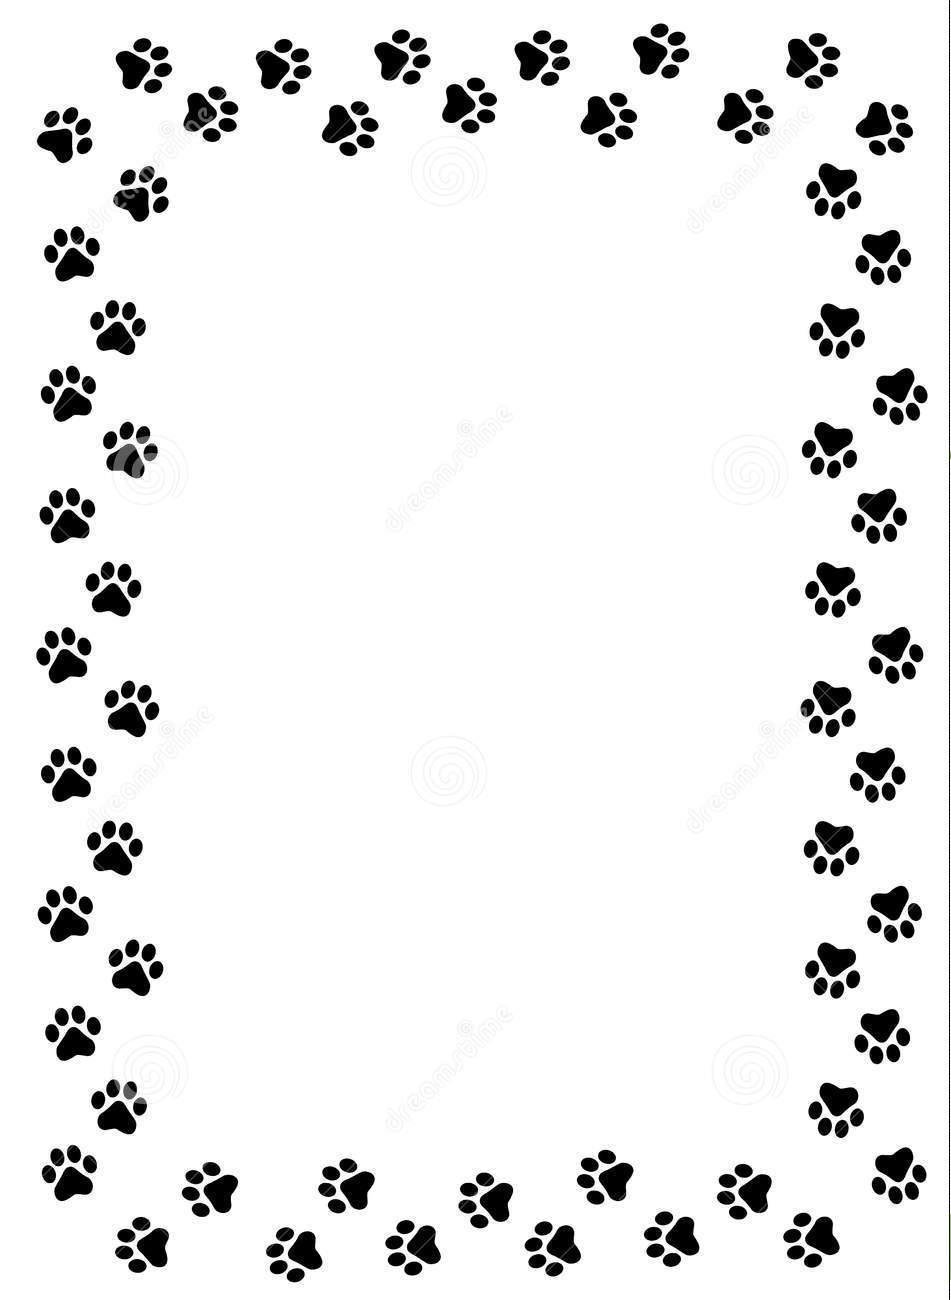 Pets clipart boarder Jerr jerr free borders clip